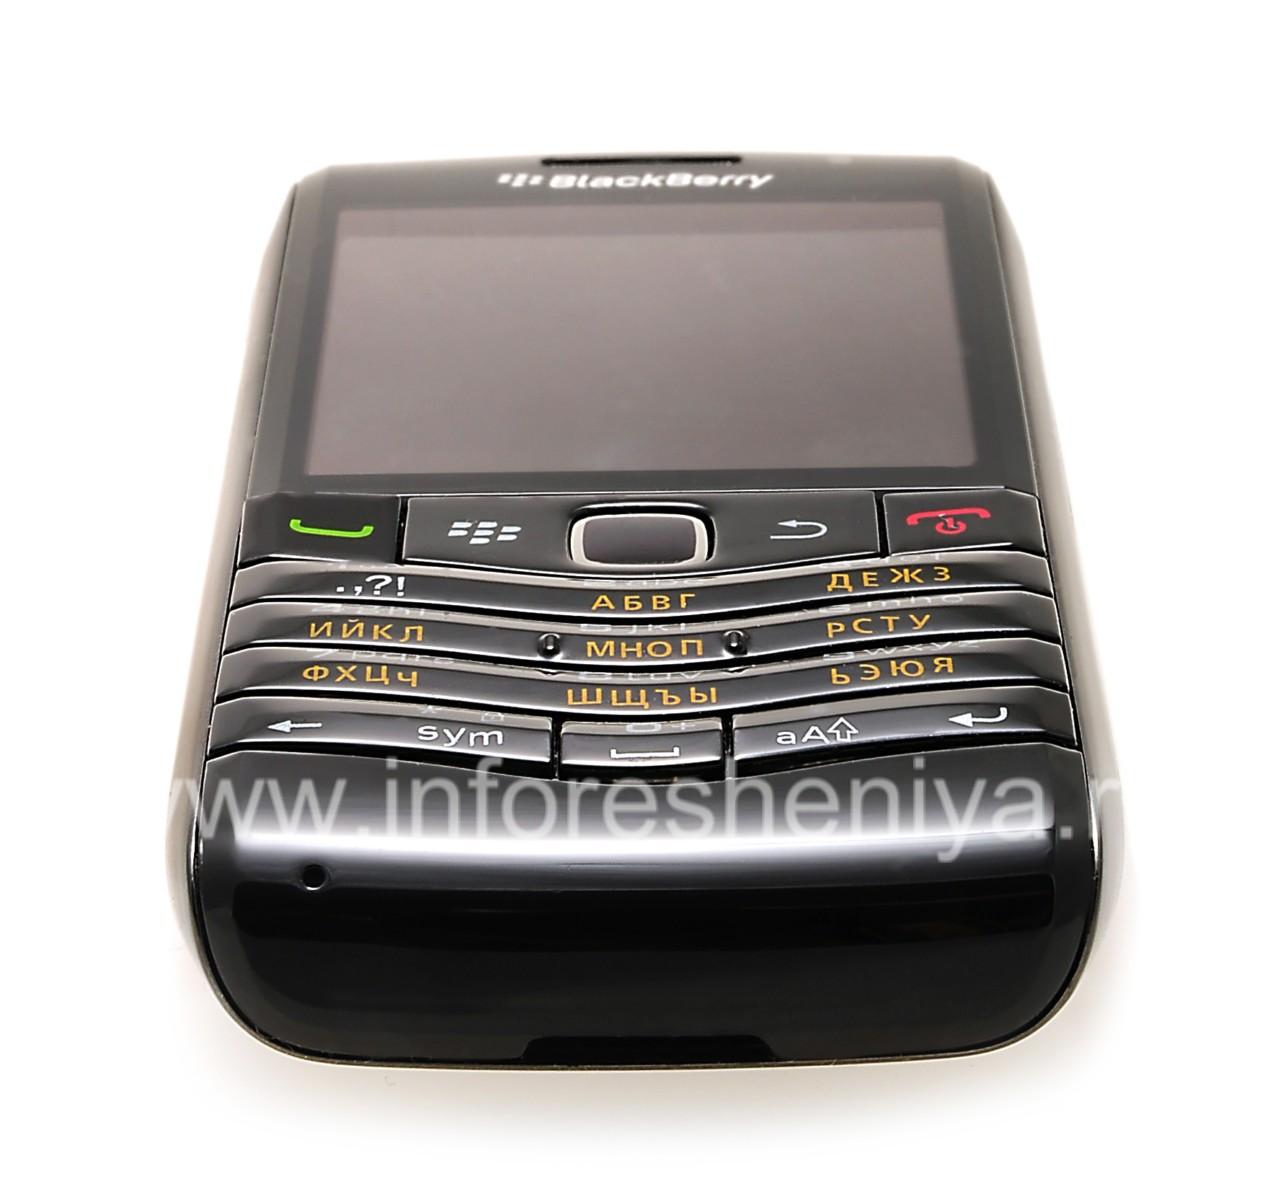 Blackberry Pearl Manual 9105 - freemixwm